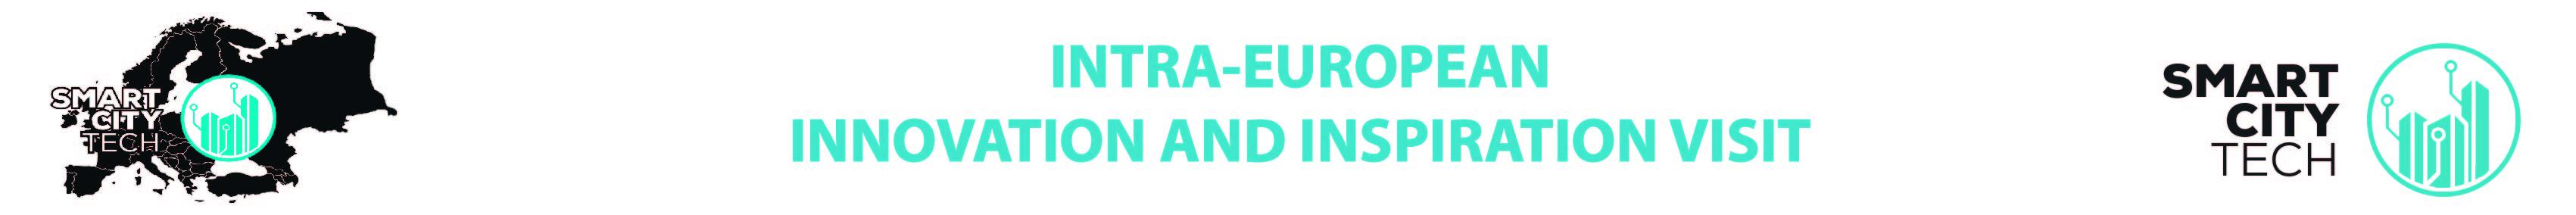 Innovation & Inspiration tour to Aveiro